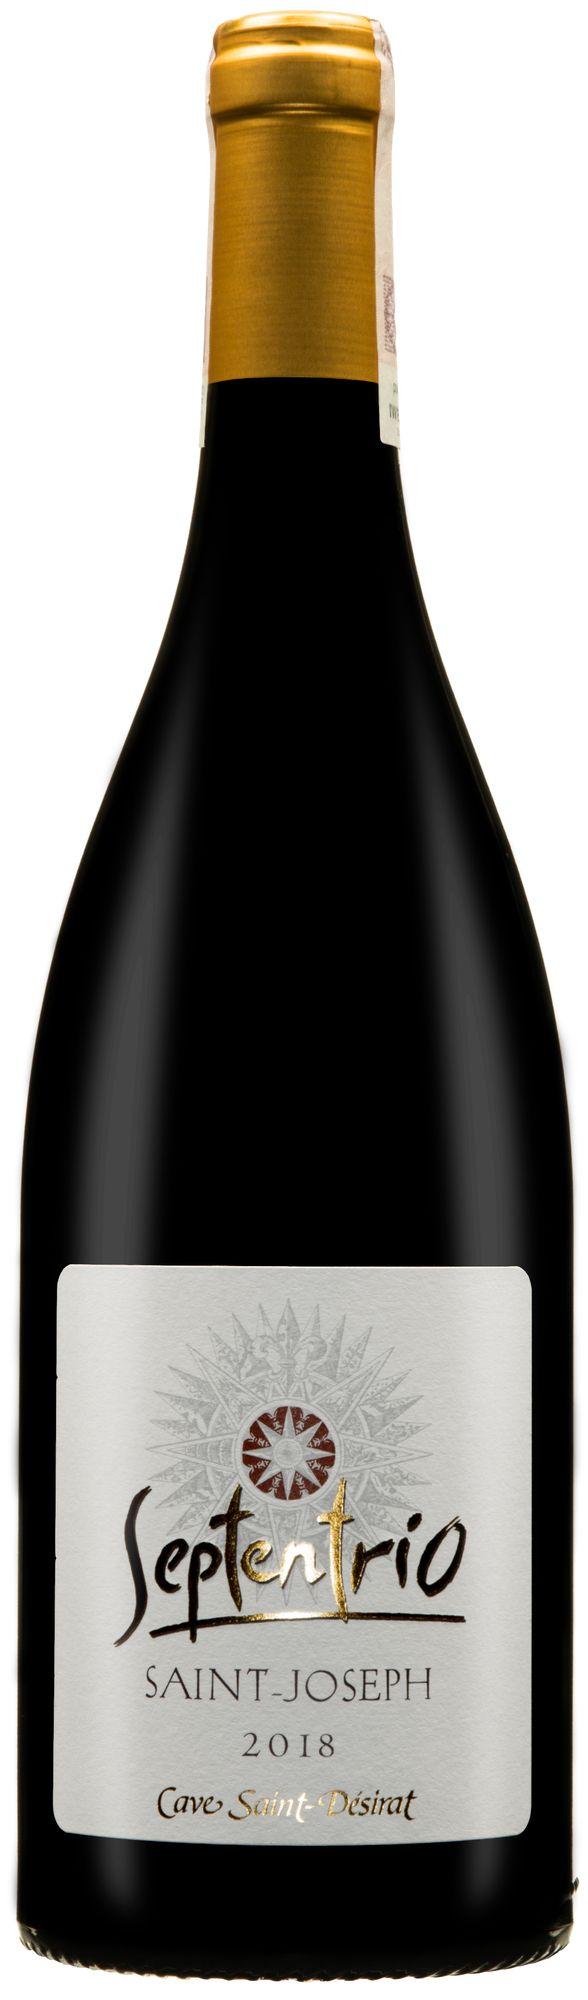 wina francuskie, marek kondrat, syrah, północny rodan